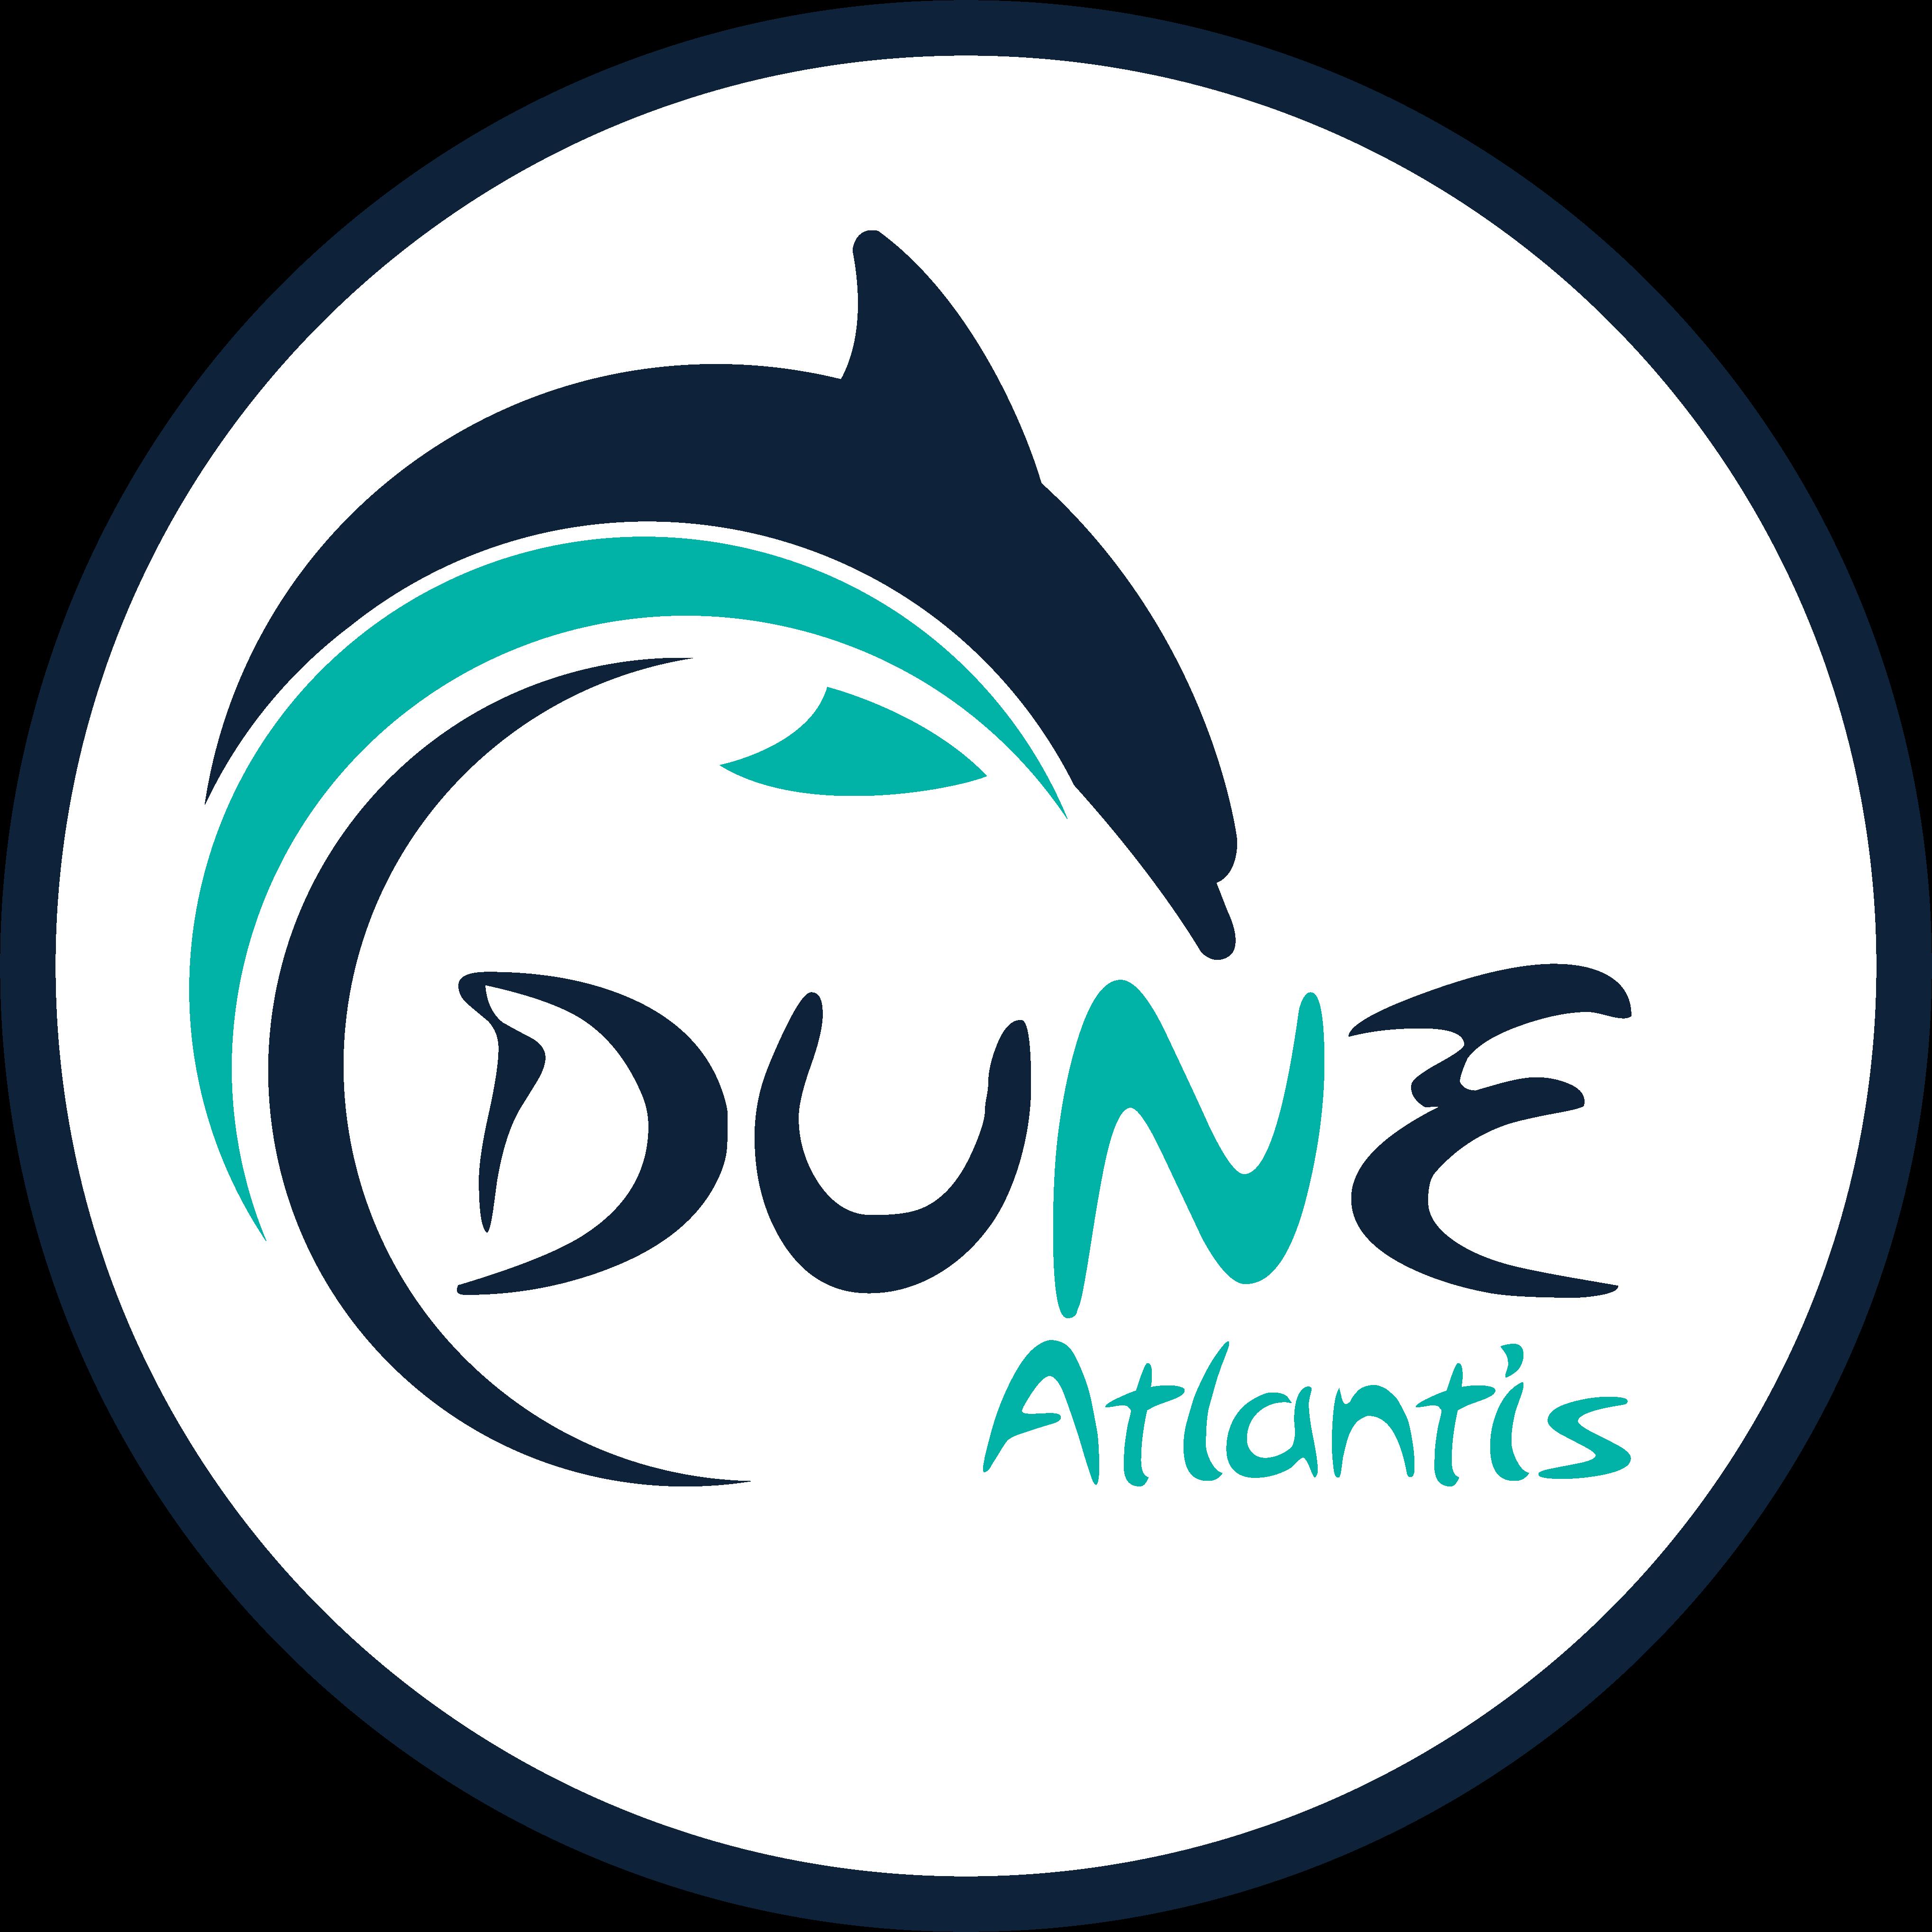 Dune Atlantis